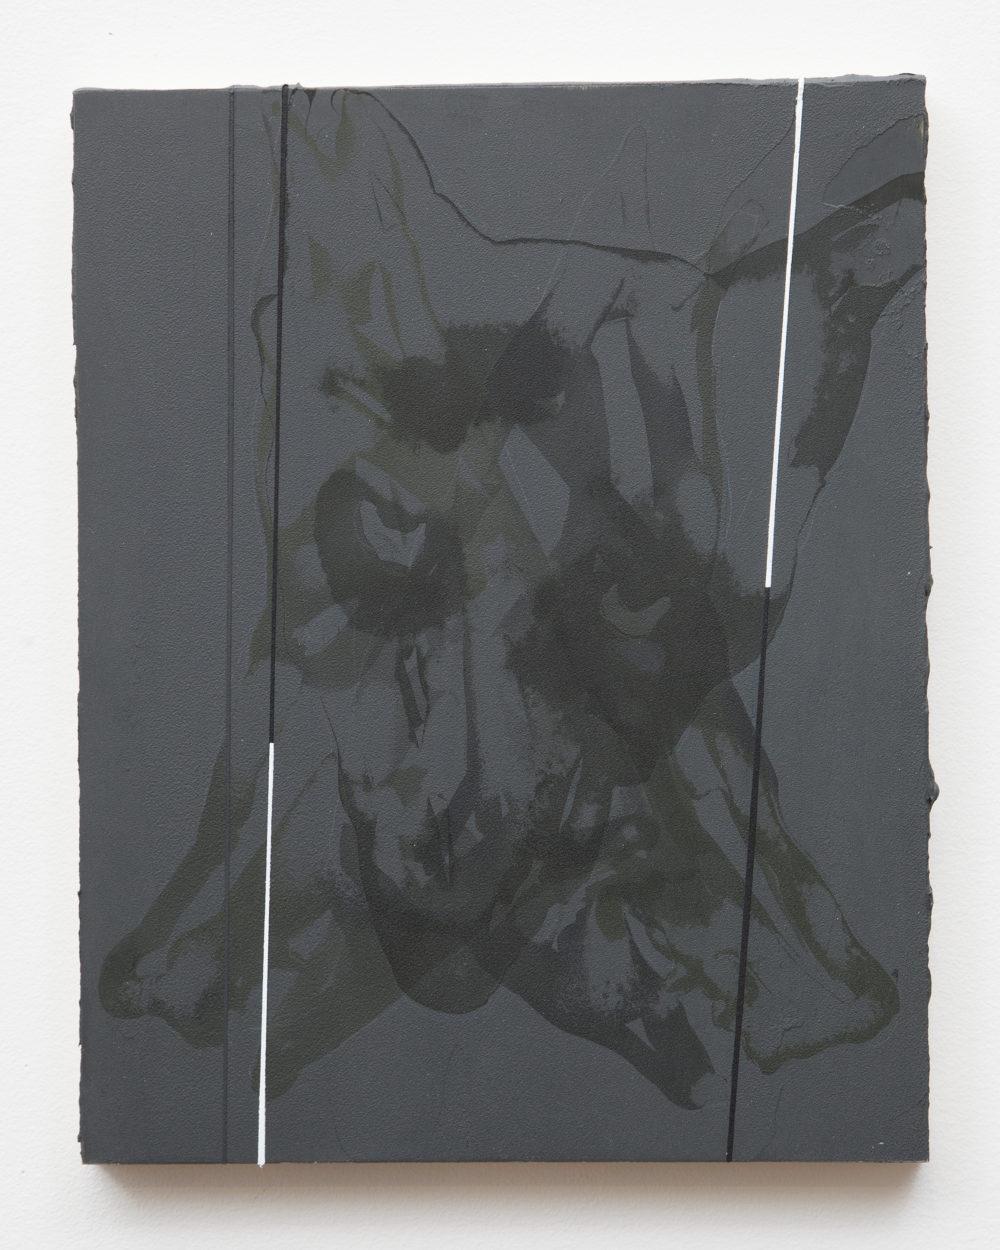 Dark gray tonal painting with an animal face.